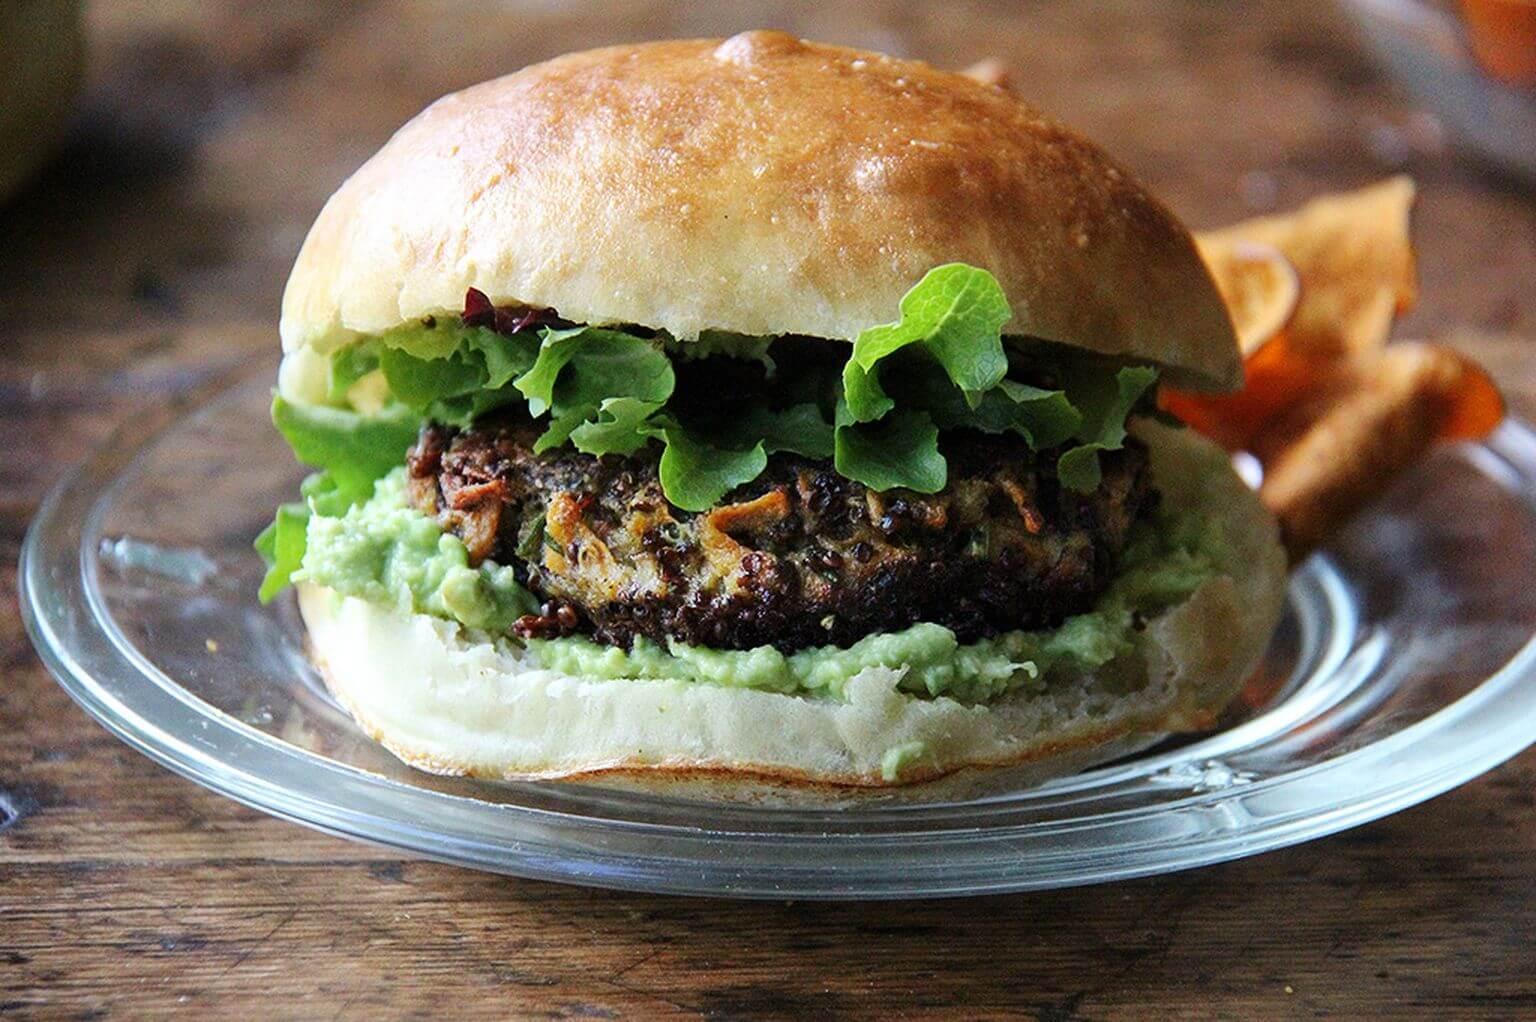 A mushroom-quinoa veggie burger on a plate.